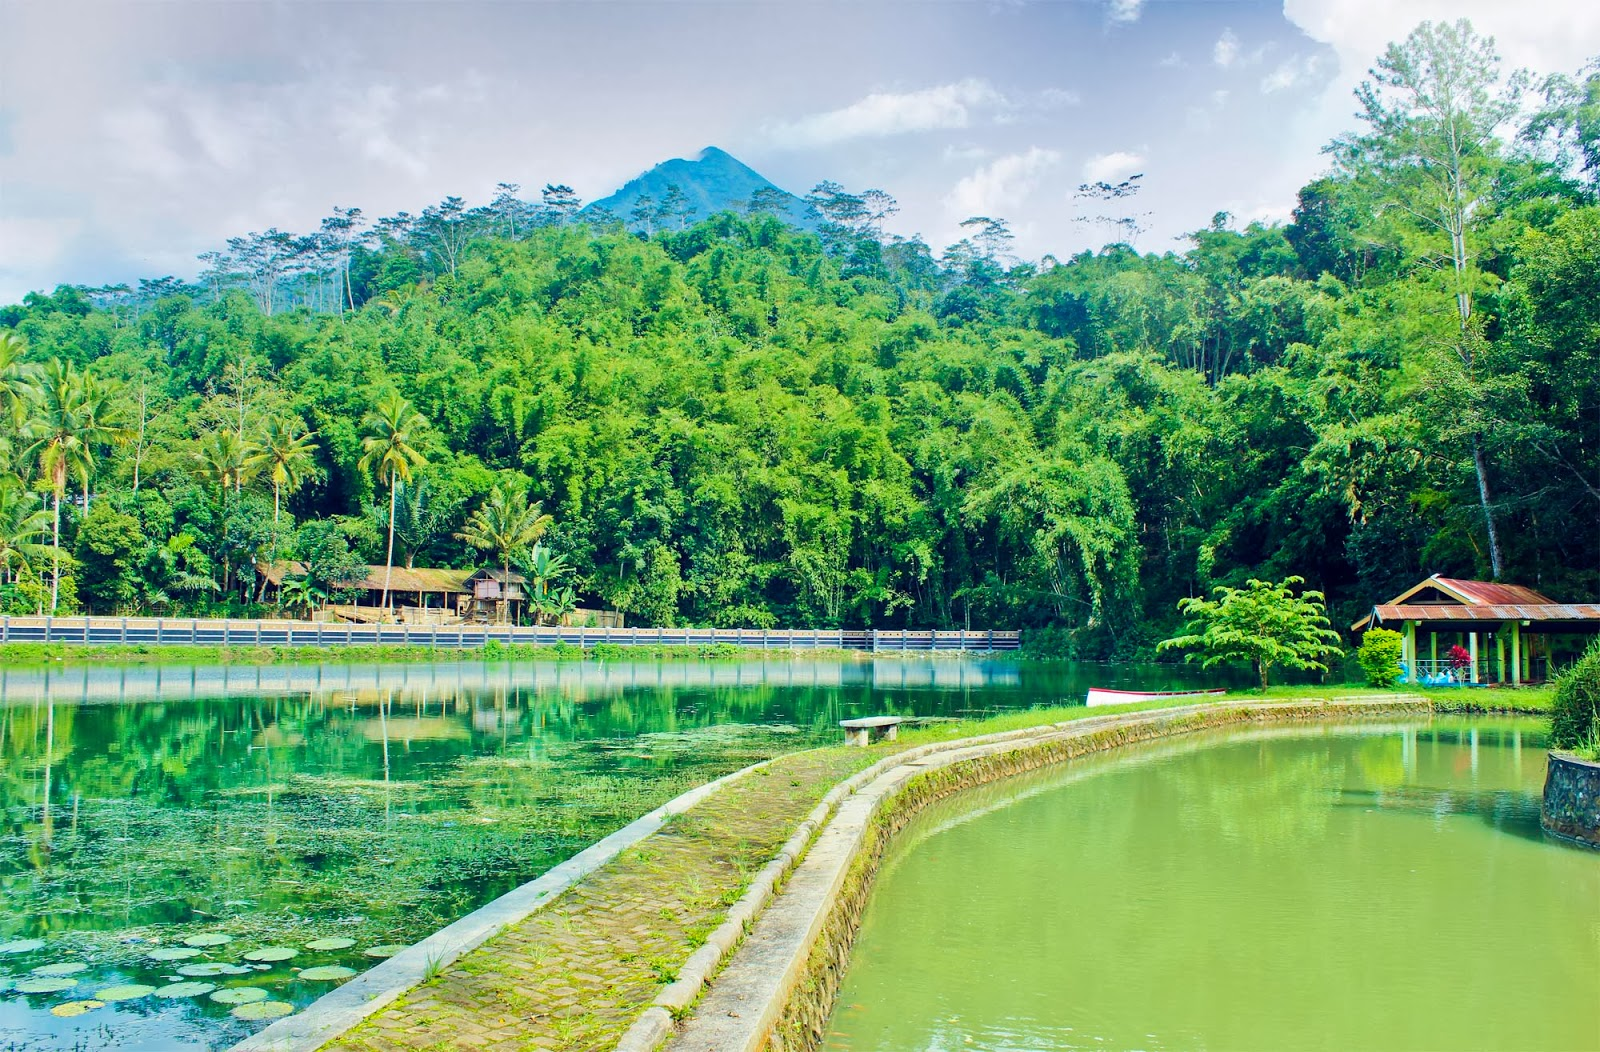 telaga blender Jawa Tengah